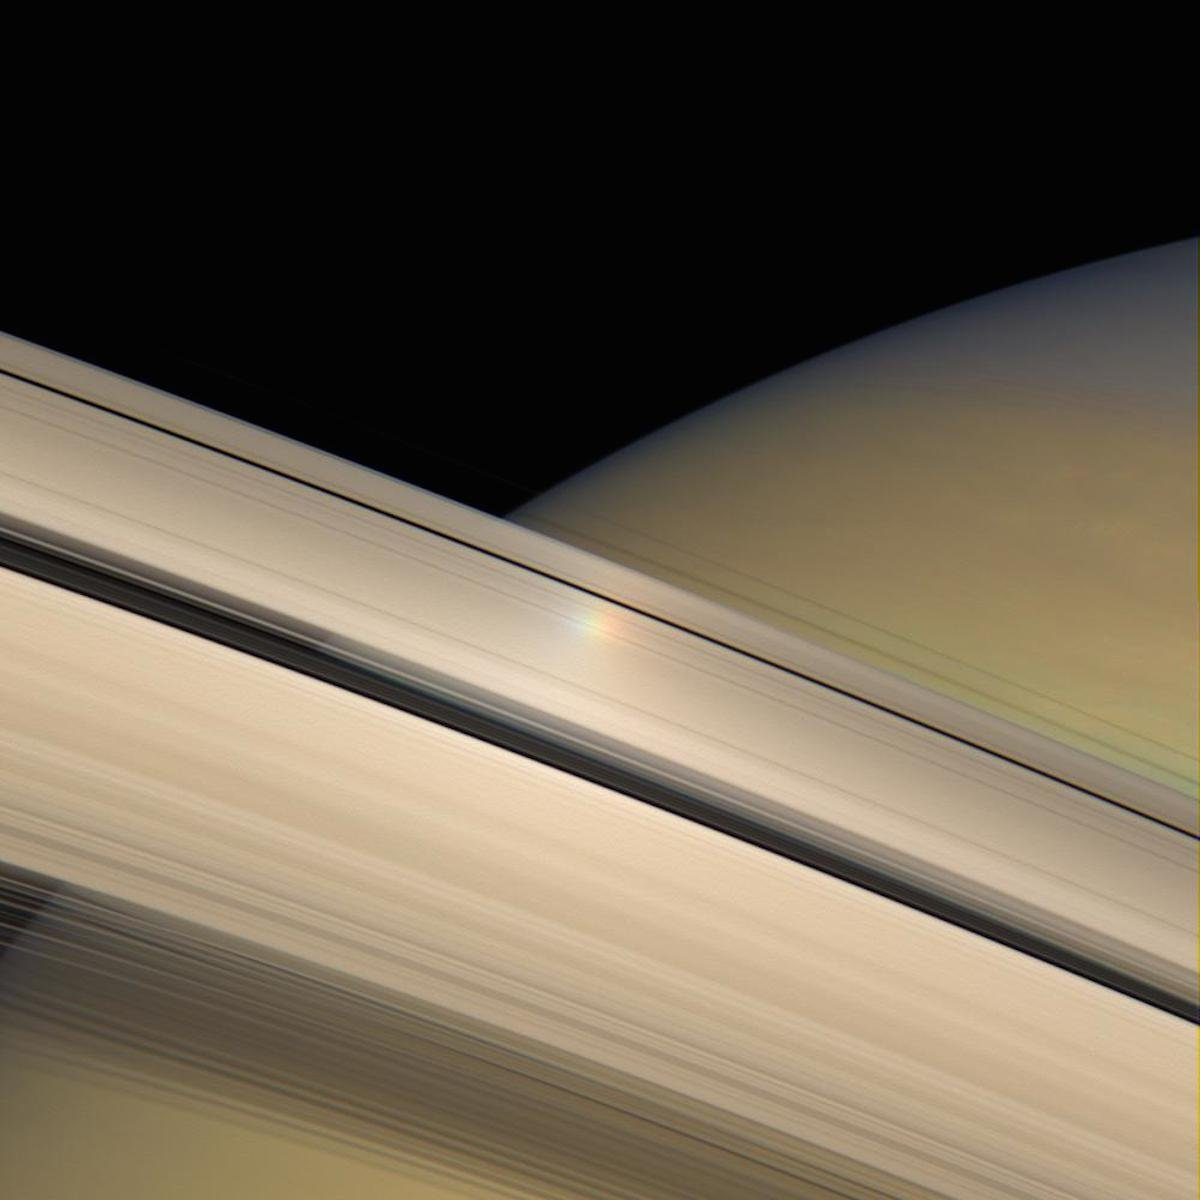 imagenes nunca vistas de saturno tomadas por la sonda cassini 12